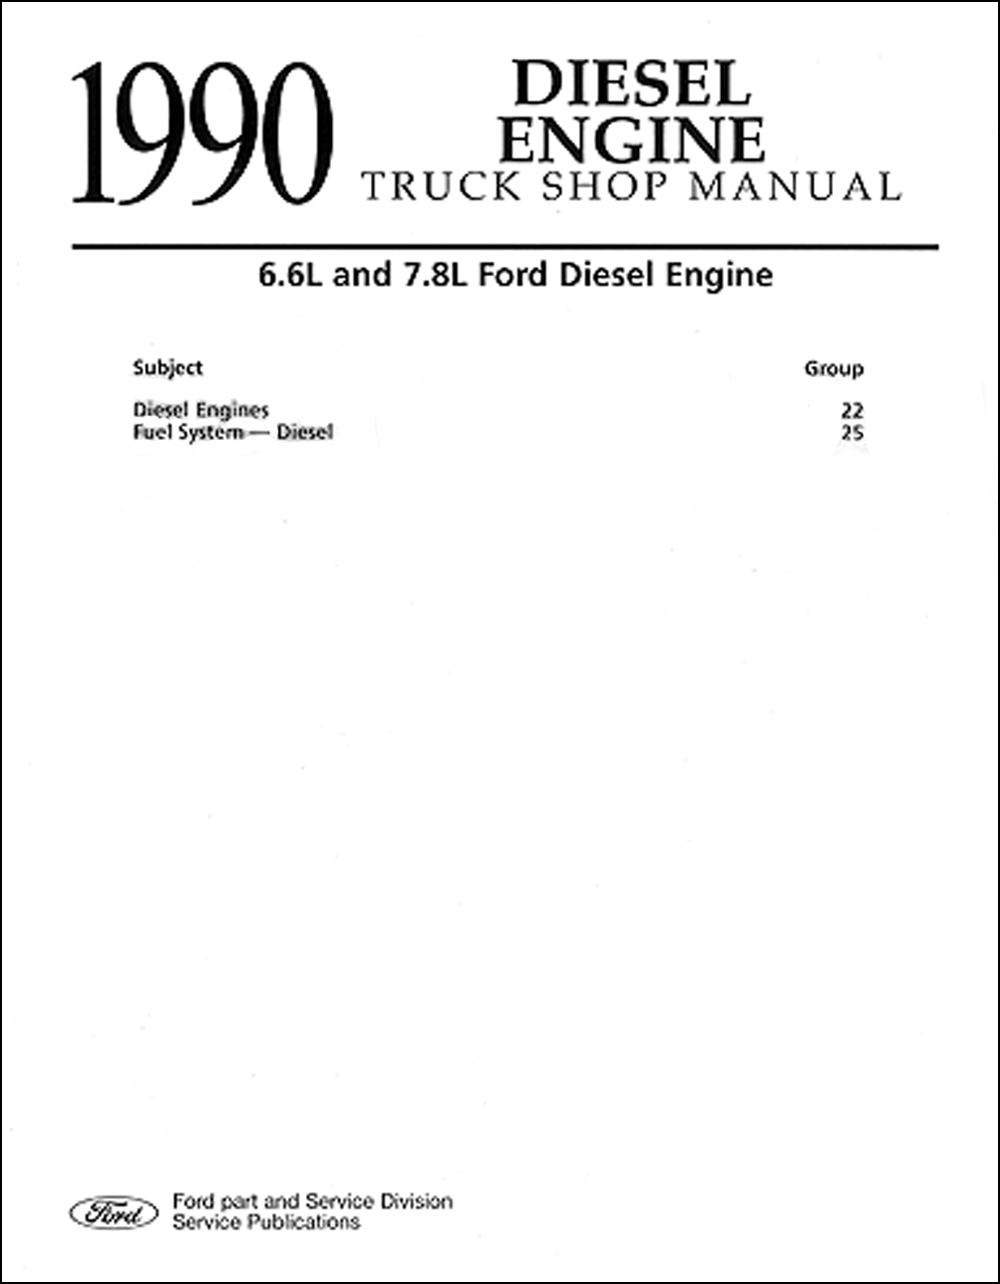 hight resolution of 1990 ford truck diesel engine repair manual original